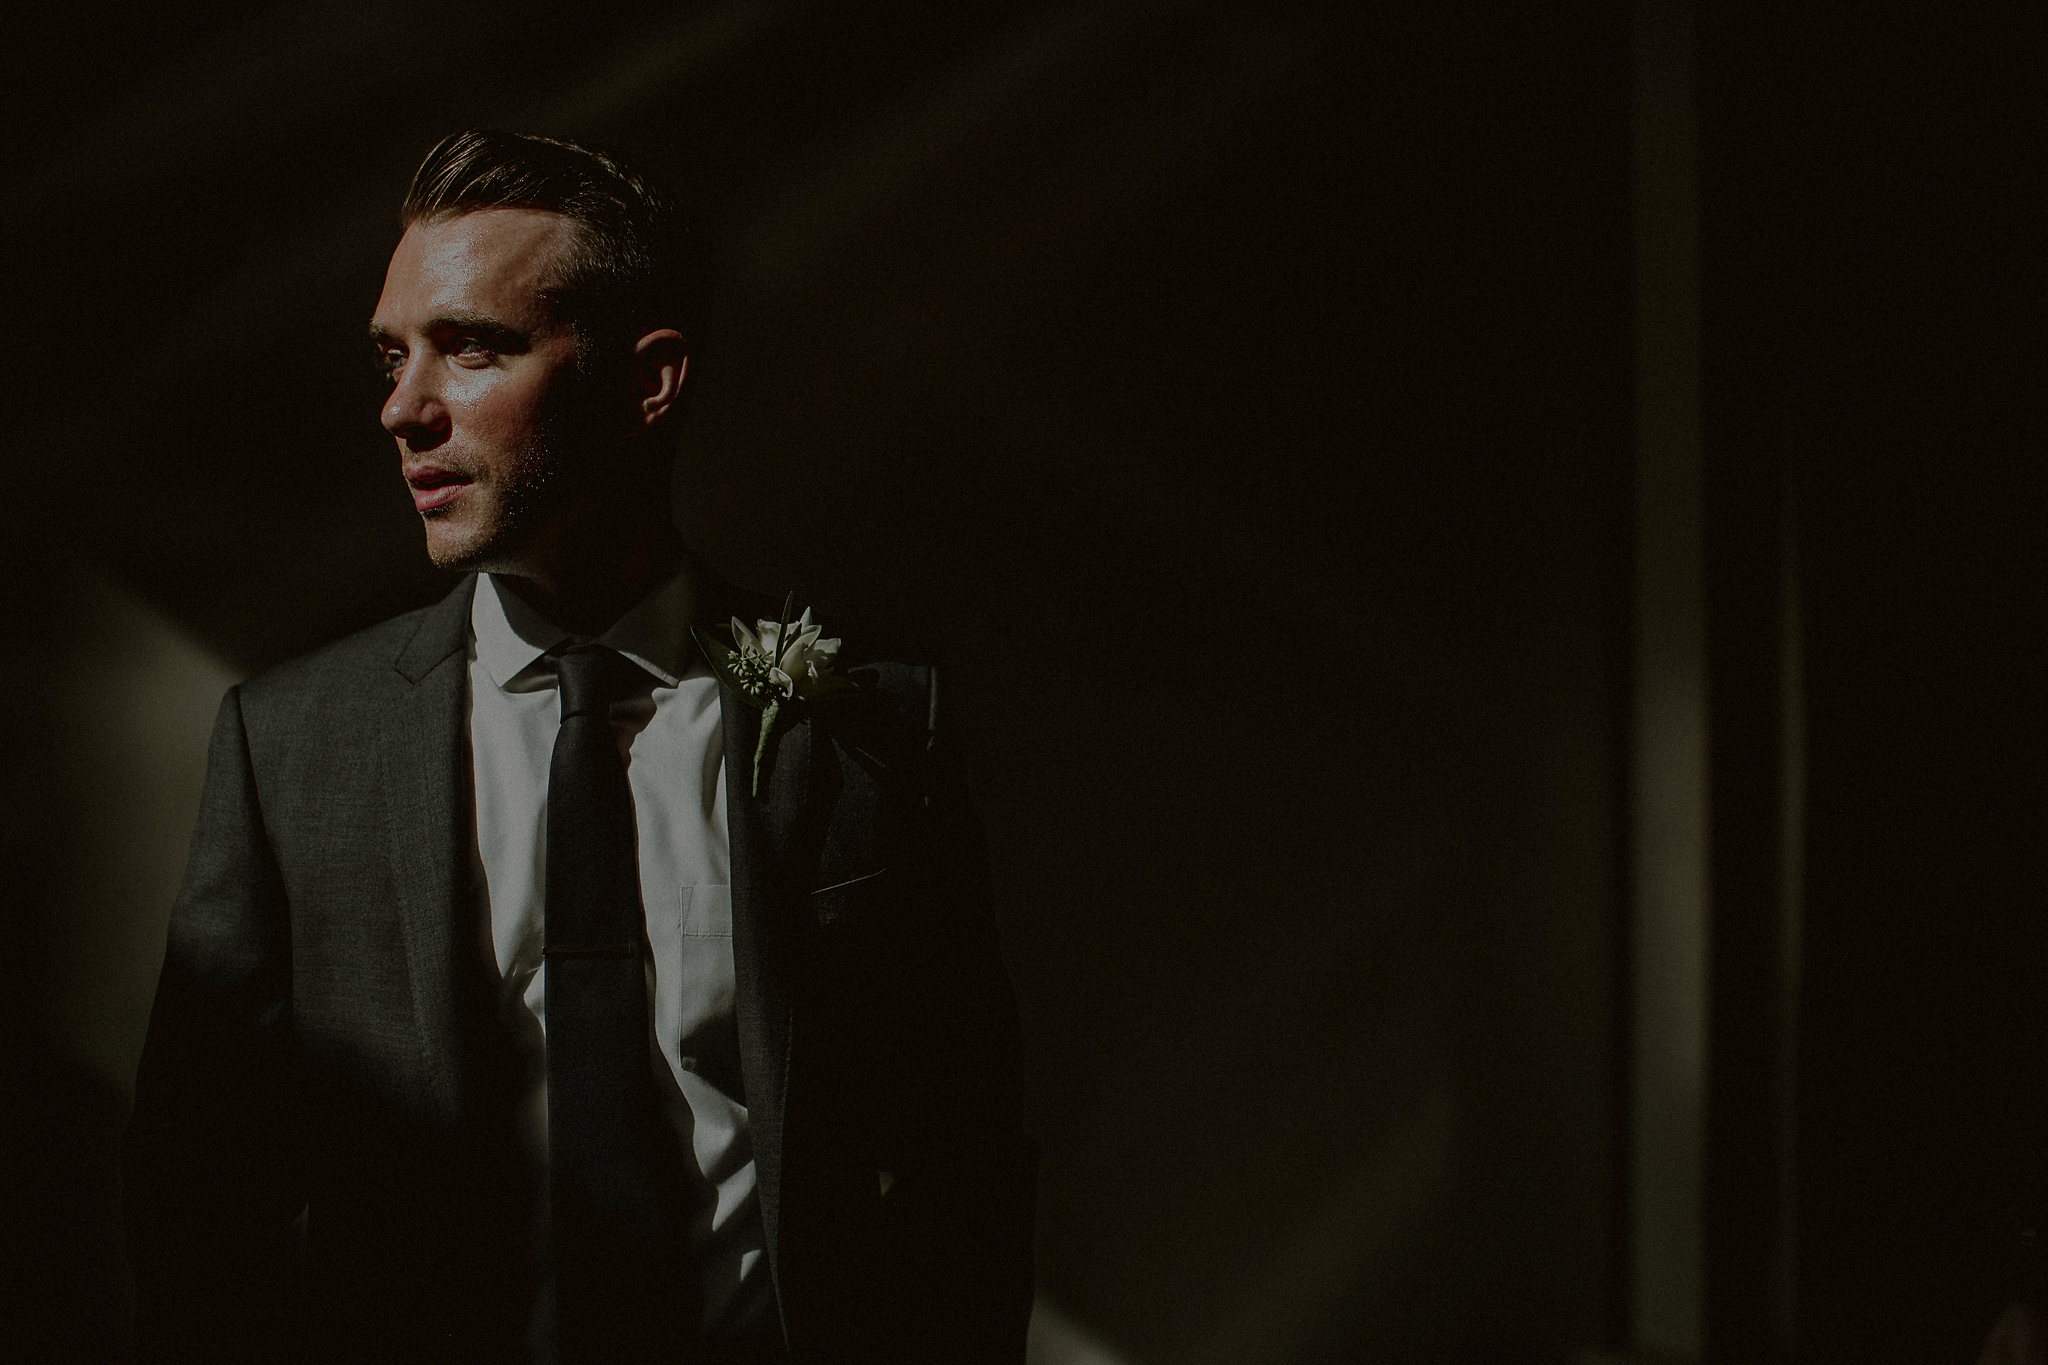 hamilton nj wedding photographer